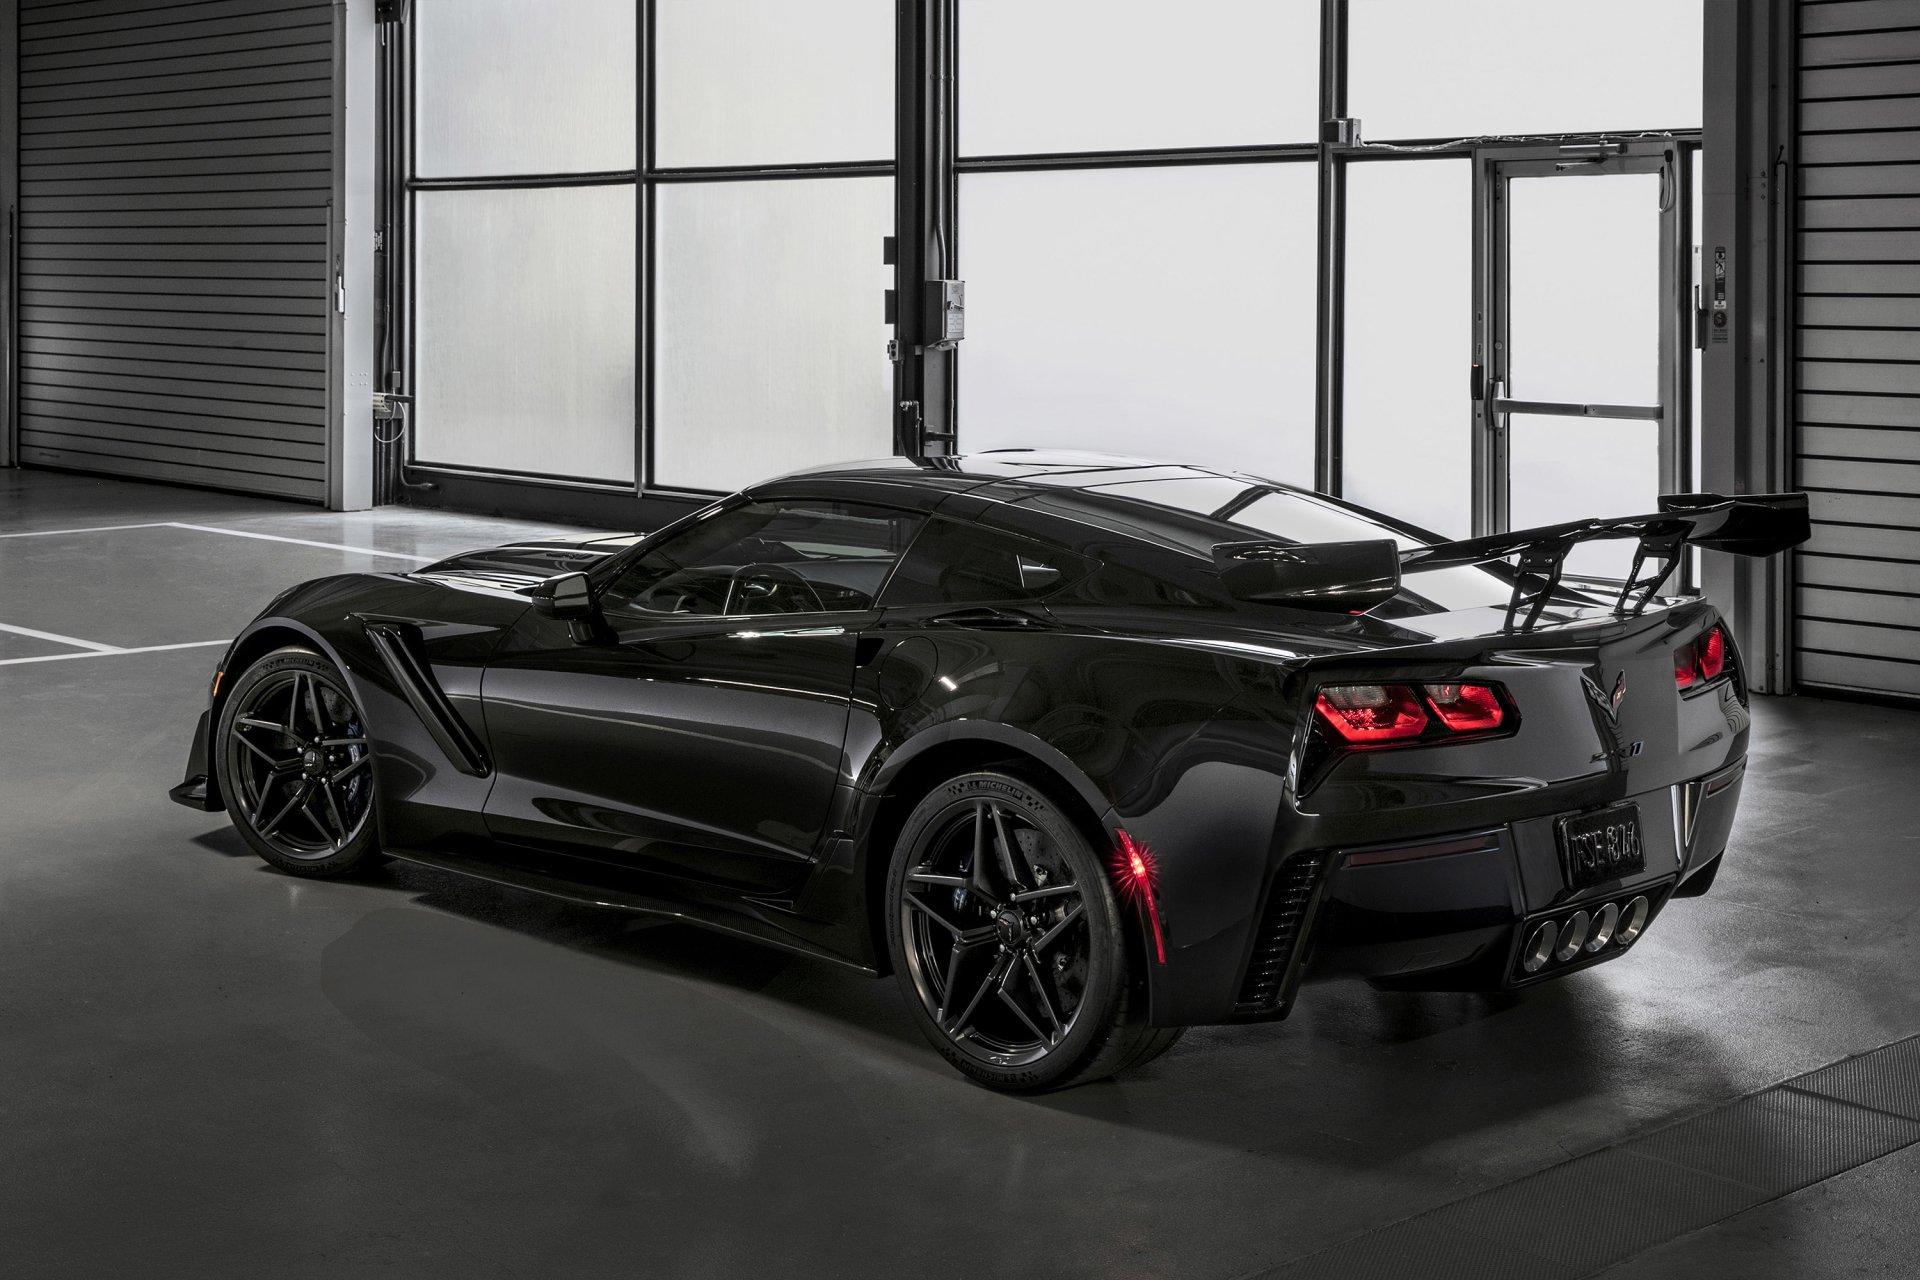 2018 Chevrolet Corvette Zr1 Fondo De Pantalla Hd Fondo De